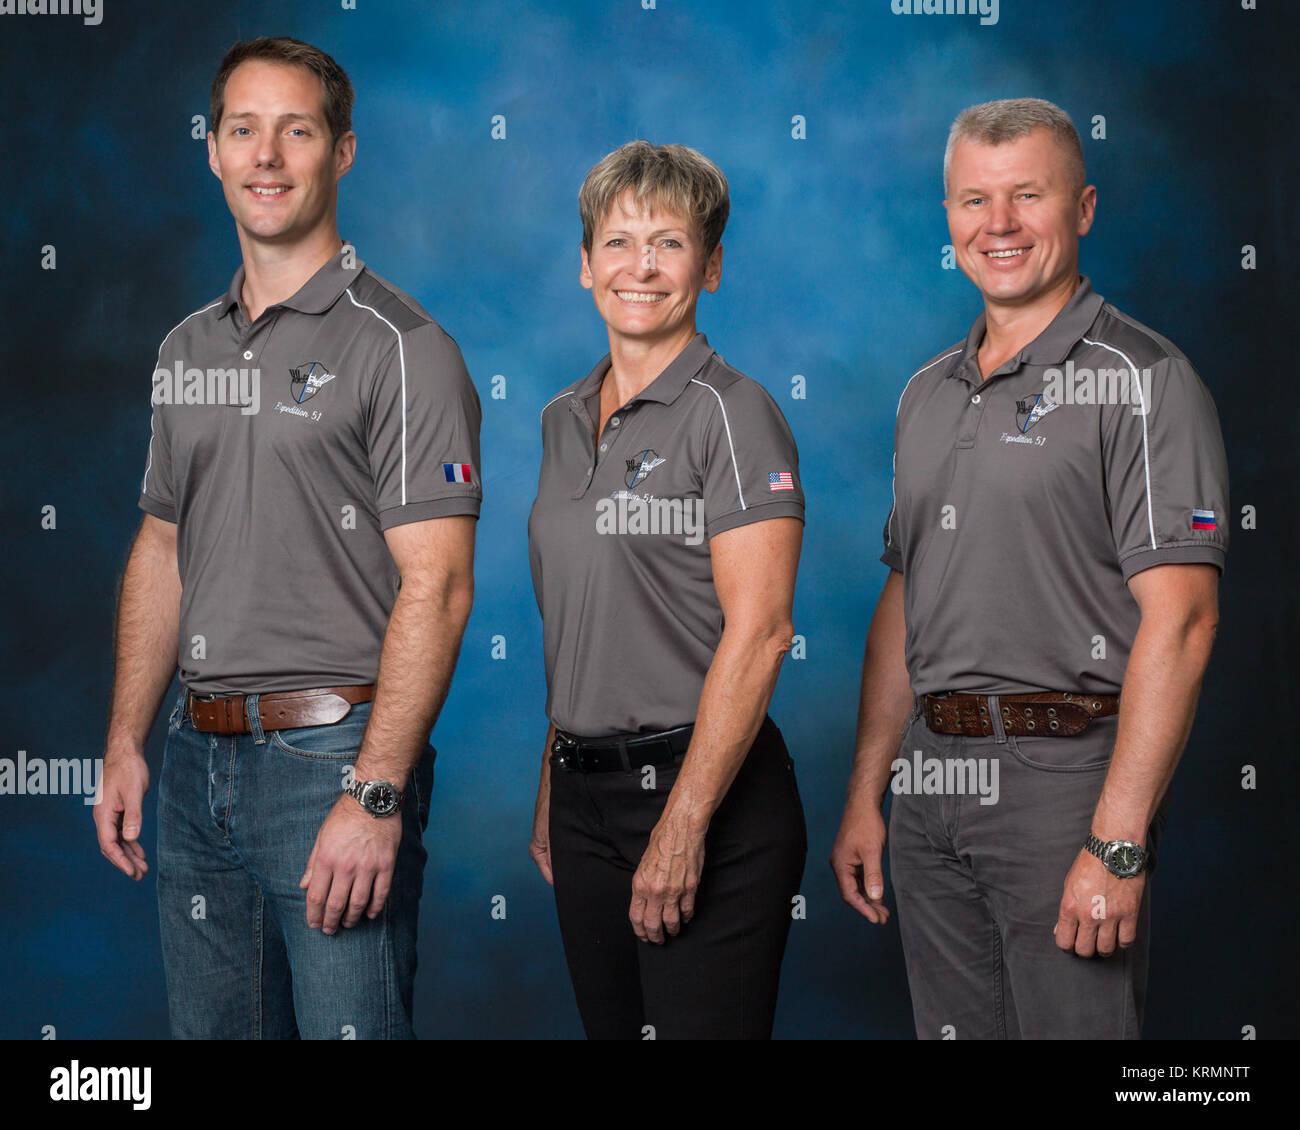 PHOTO DATE: 07-12-16 LOCATION:  Bldg. 8, Room 183 - Photo Studio SUBJECT:  Official Expedition 51 crew portrait - Stock Image